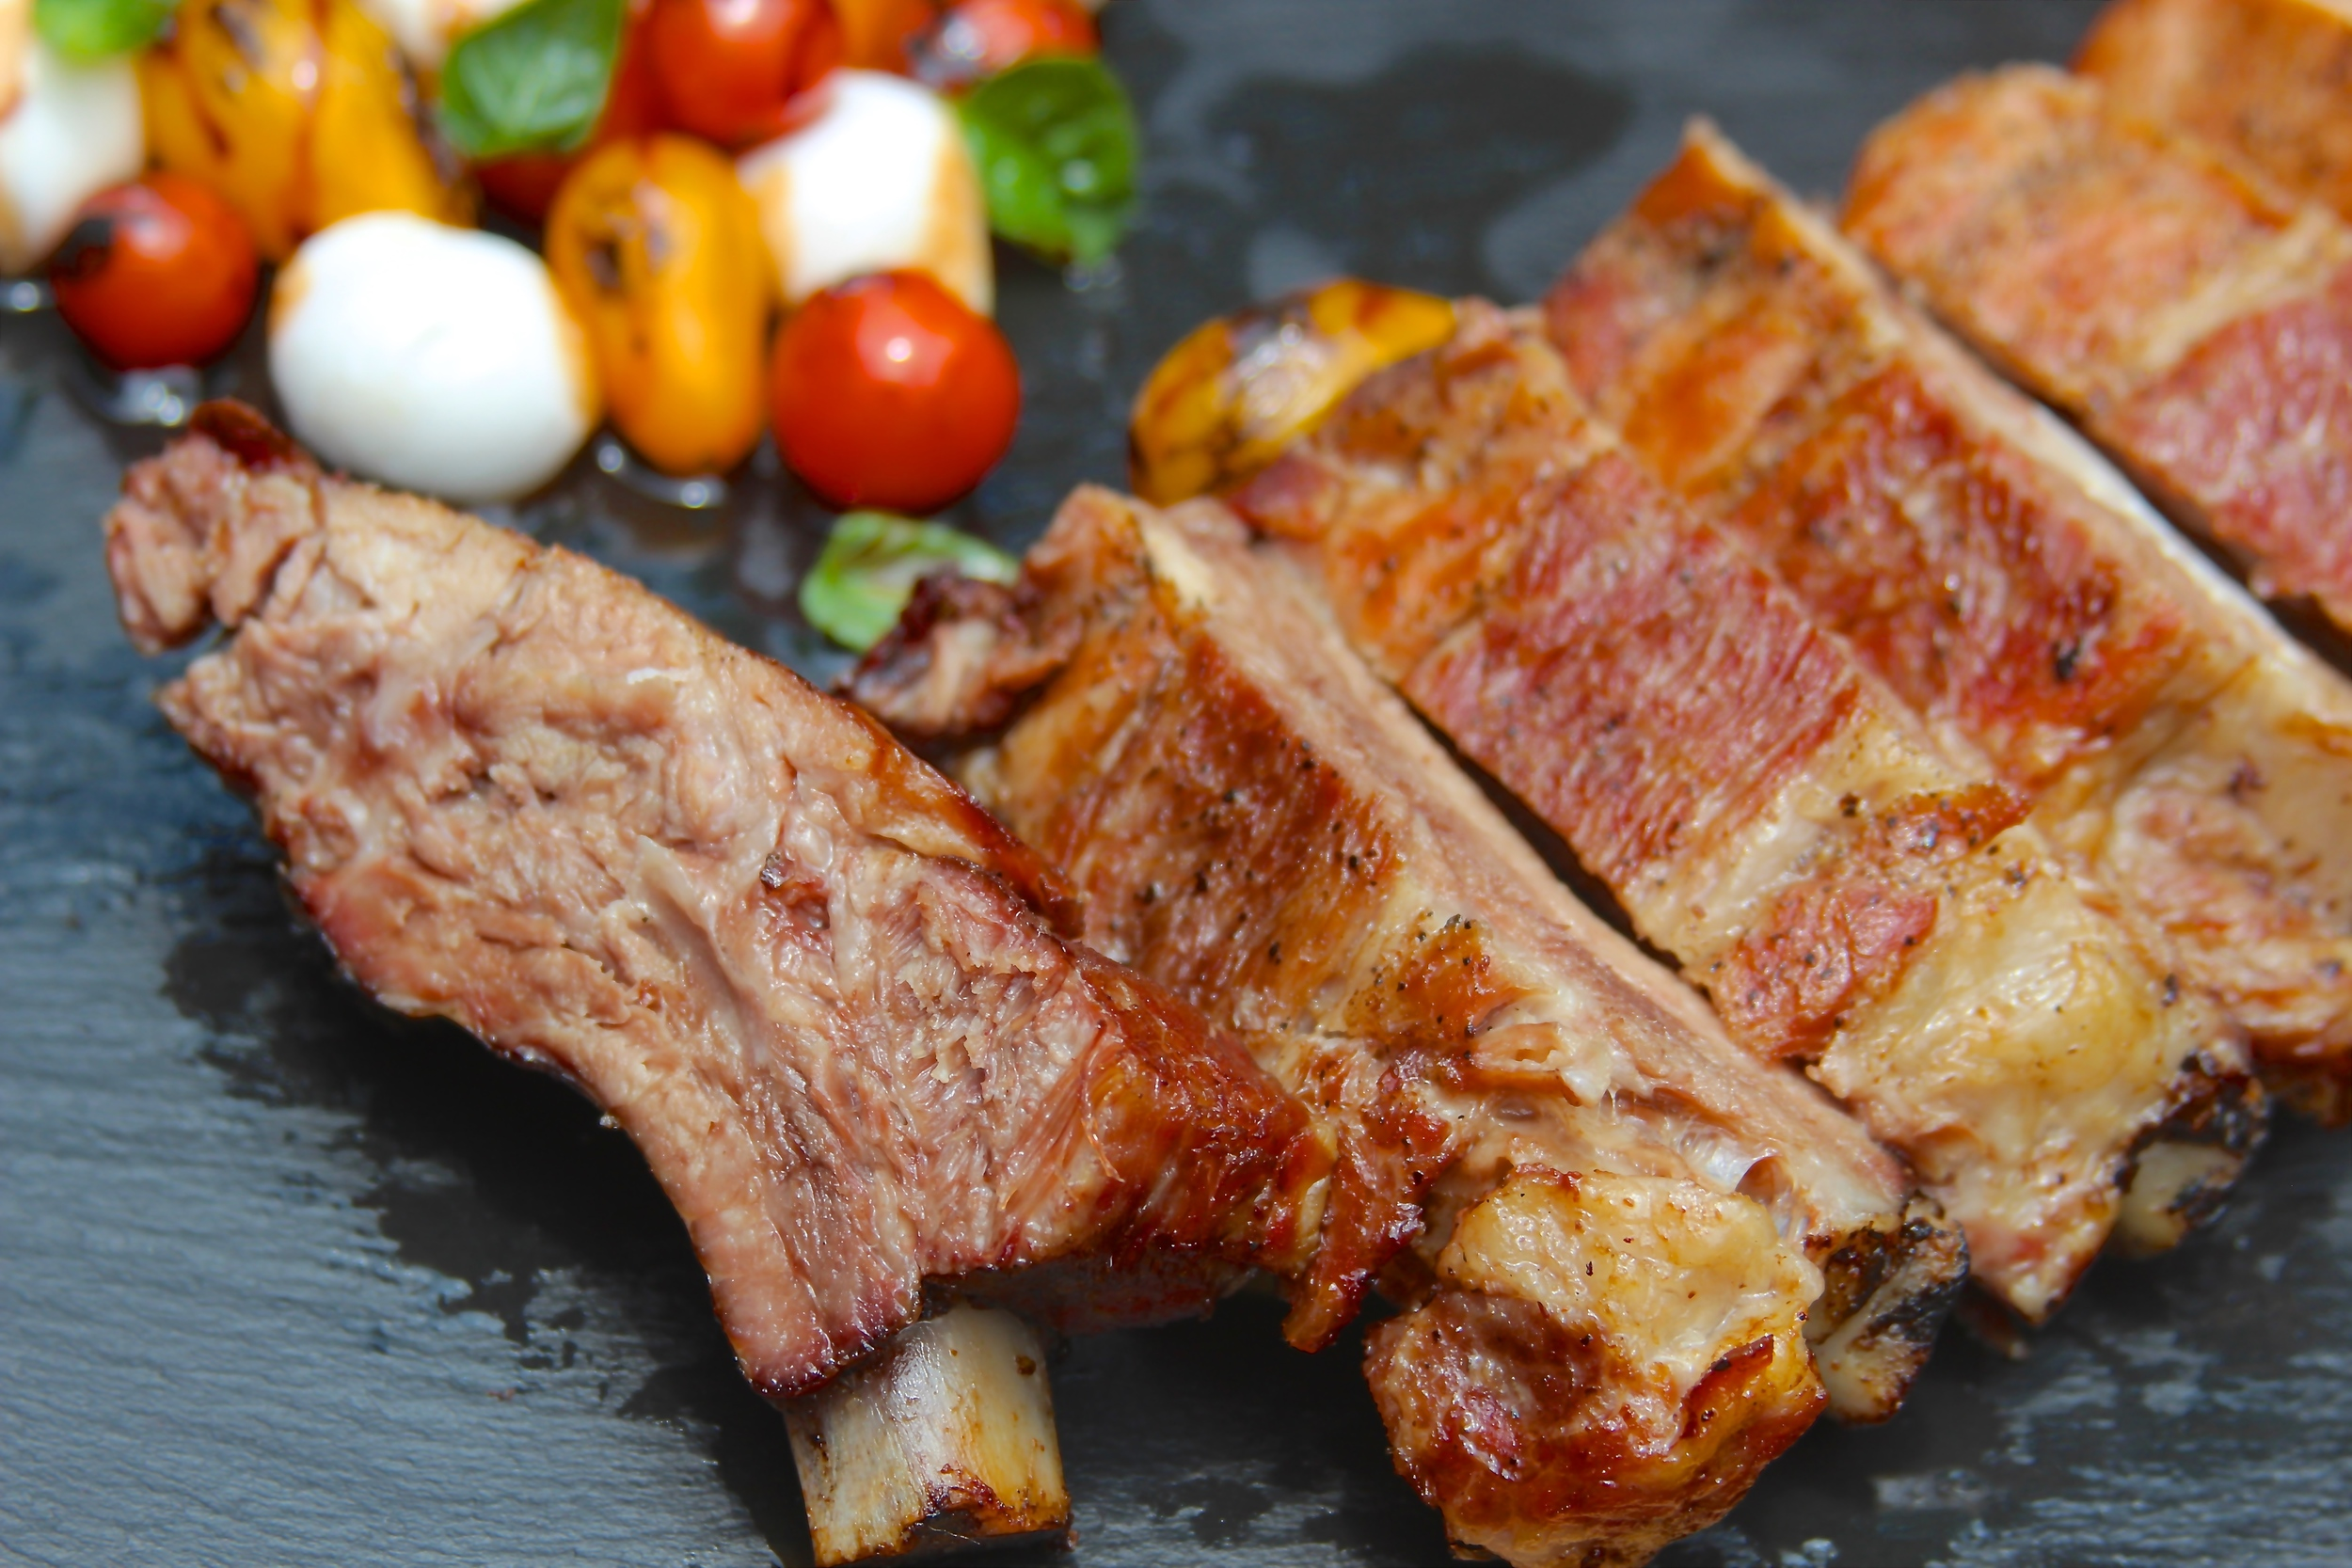 Smoked Pork Ribs Confit